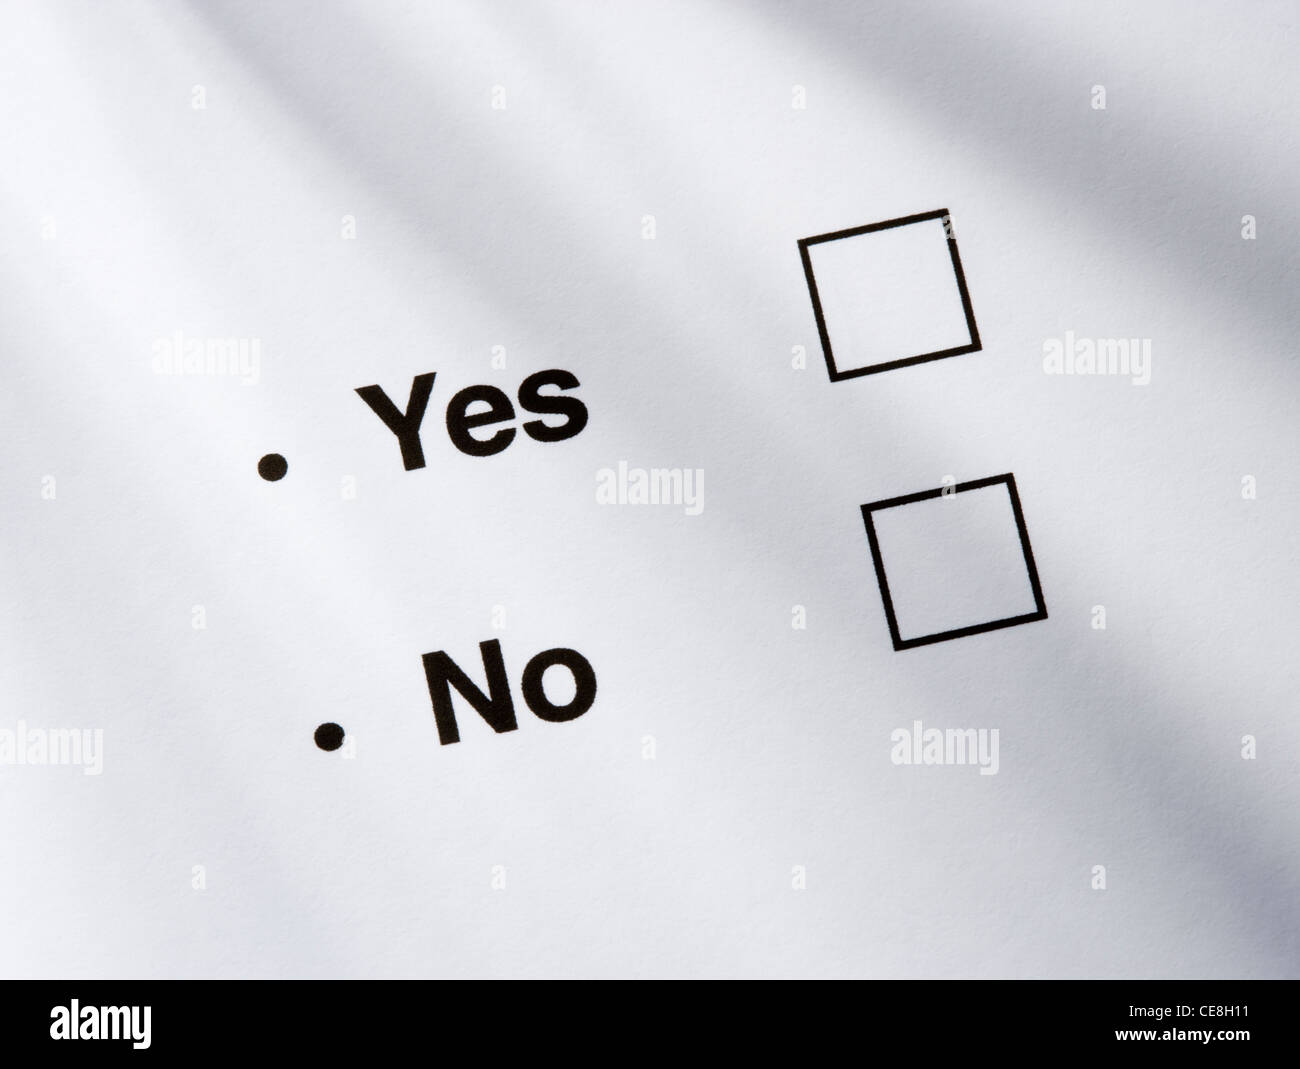 Yes/no option boxes. - Stock Image